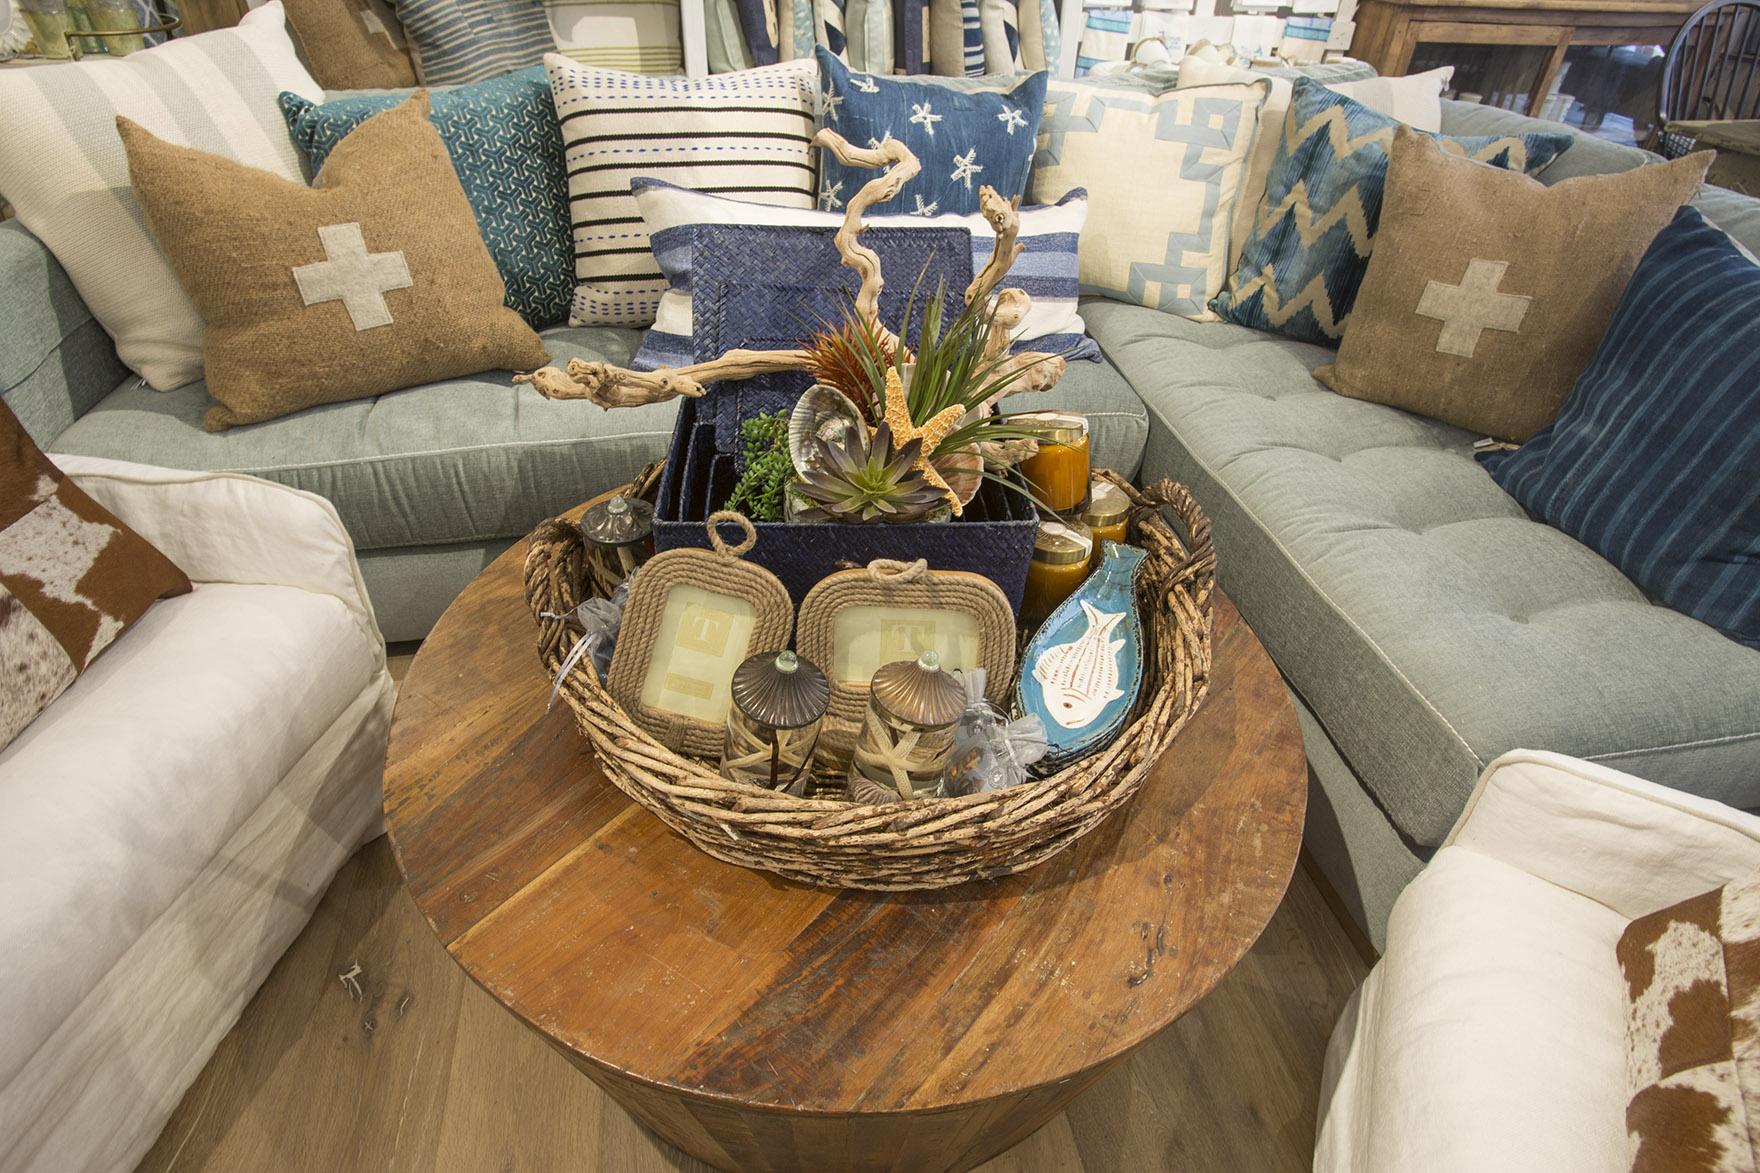 Awe Inspiring Laguna Beach Tuvalu Store Tuvalu Coastal Home Furnishings Unemploymentrelief Wooden Chair Designs For Living Room Unemploymentrelieforg